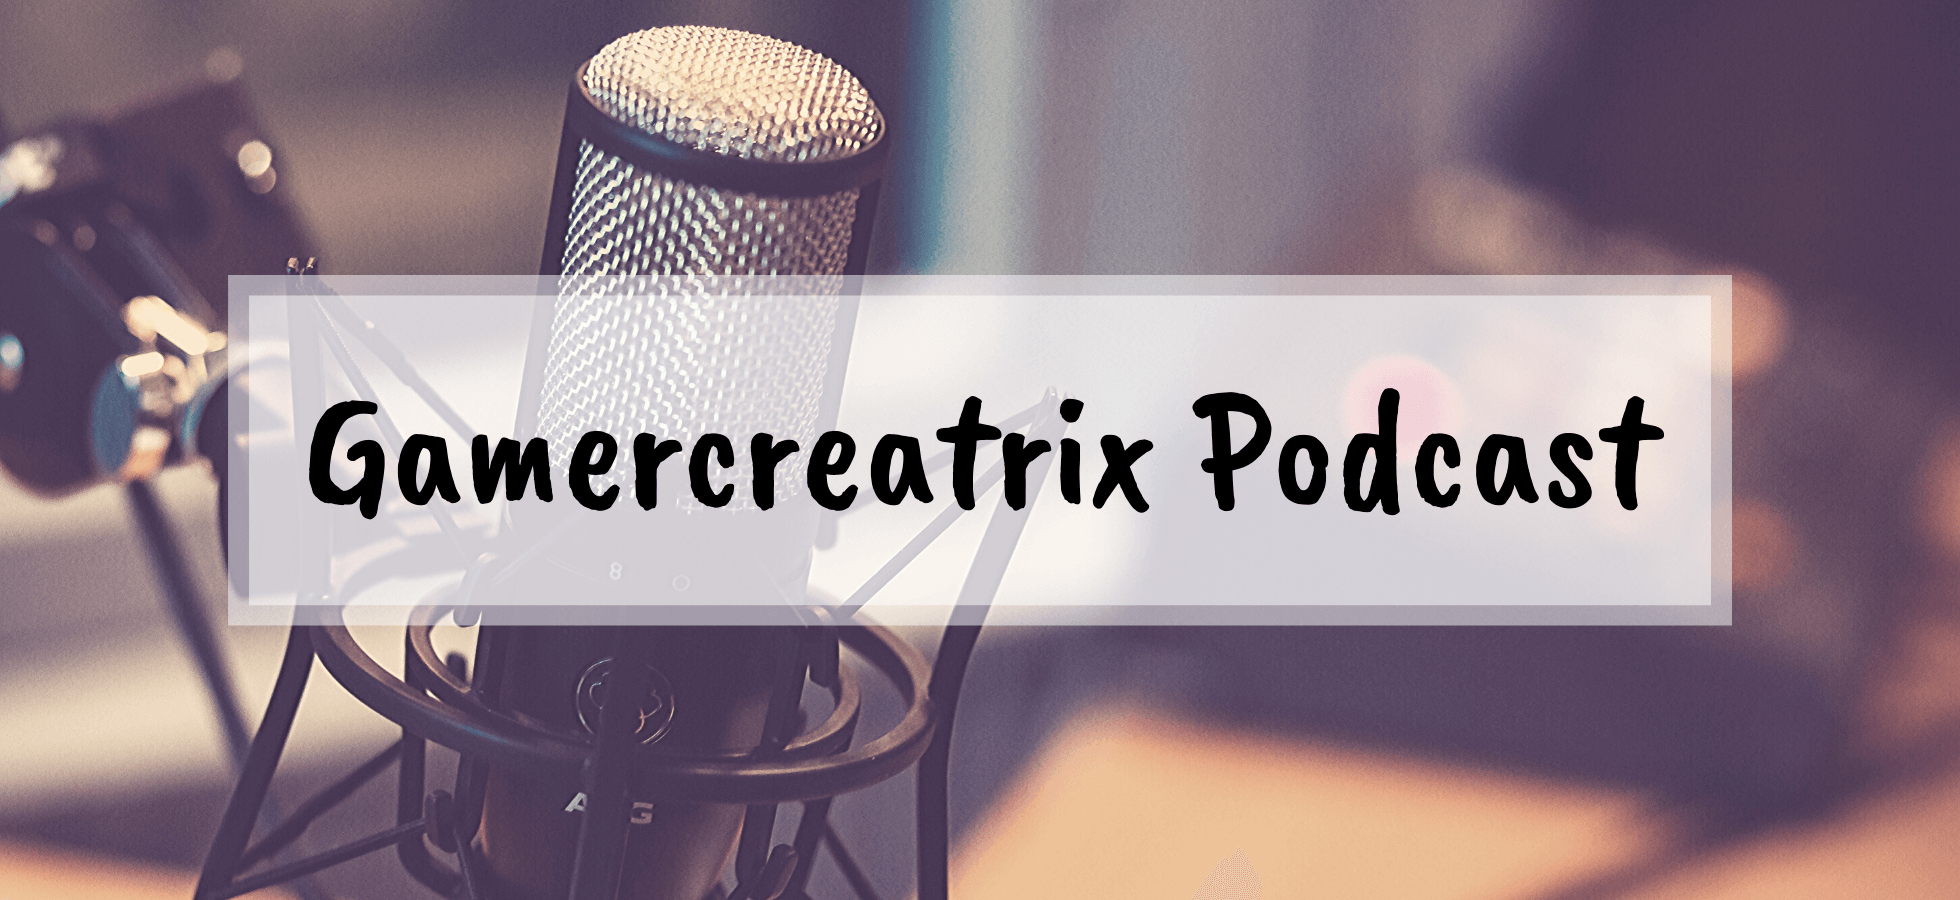 Gamercreatrix Podcast